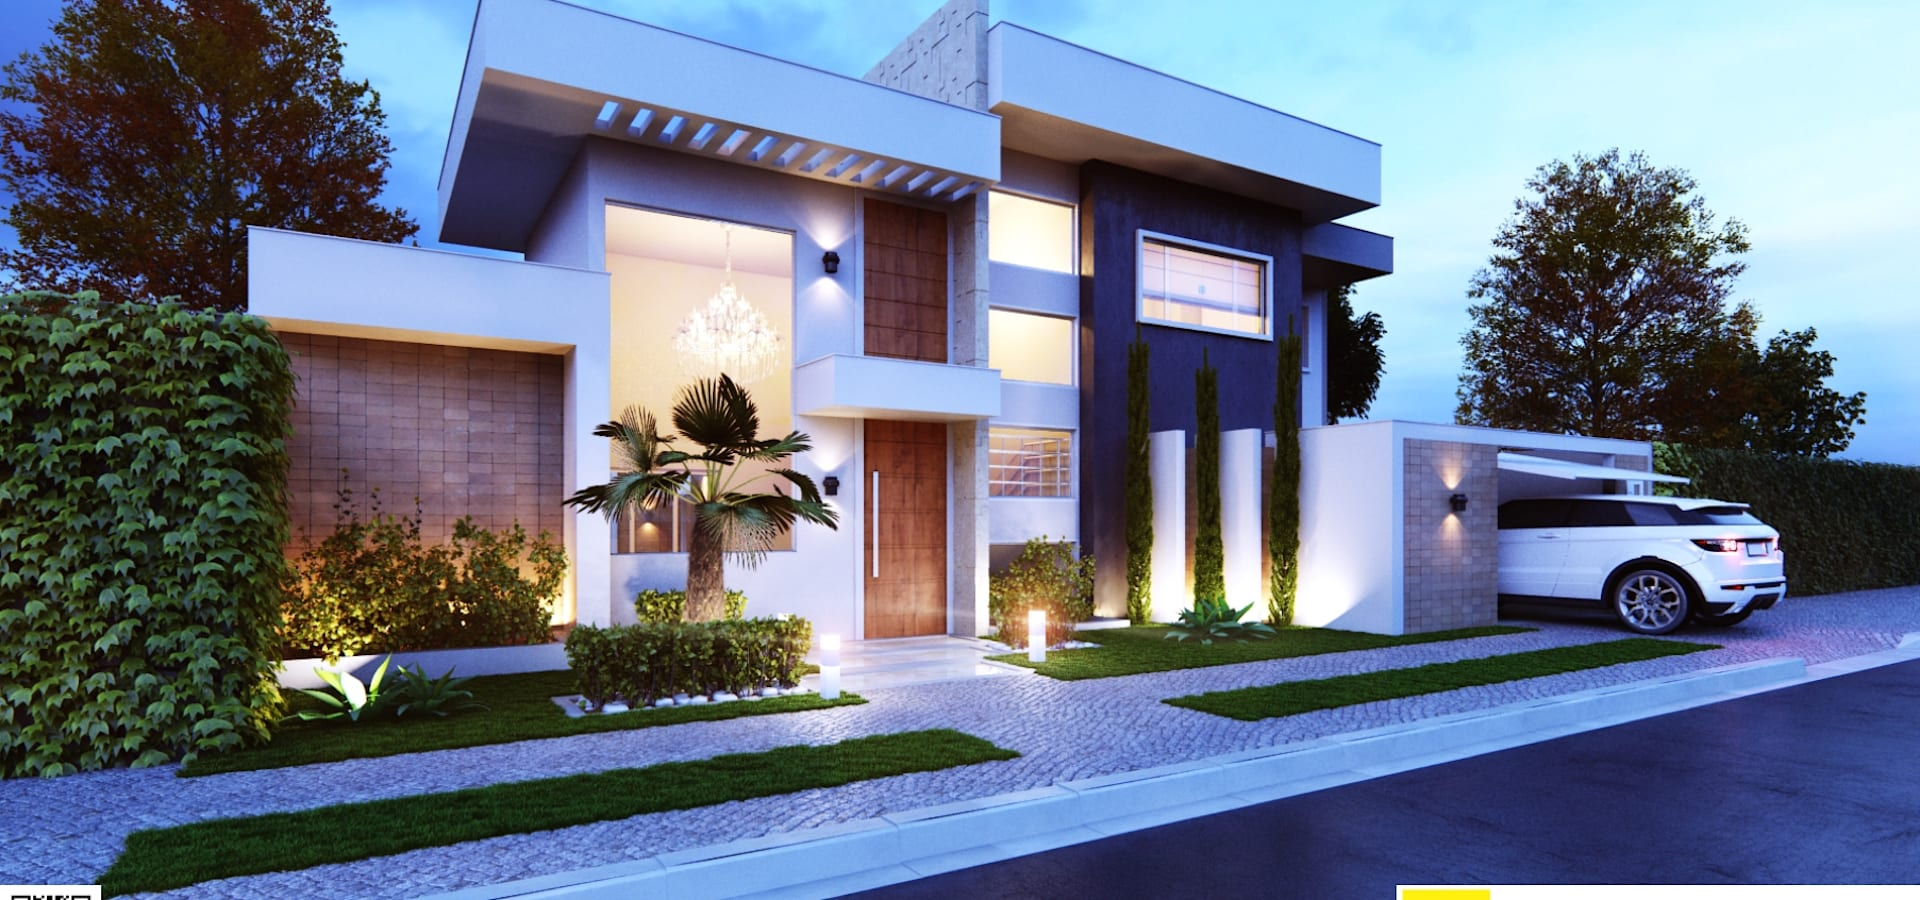 Amauri Berton Arquitetura